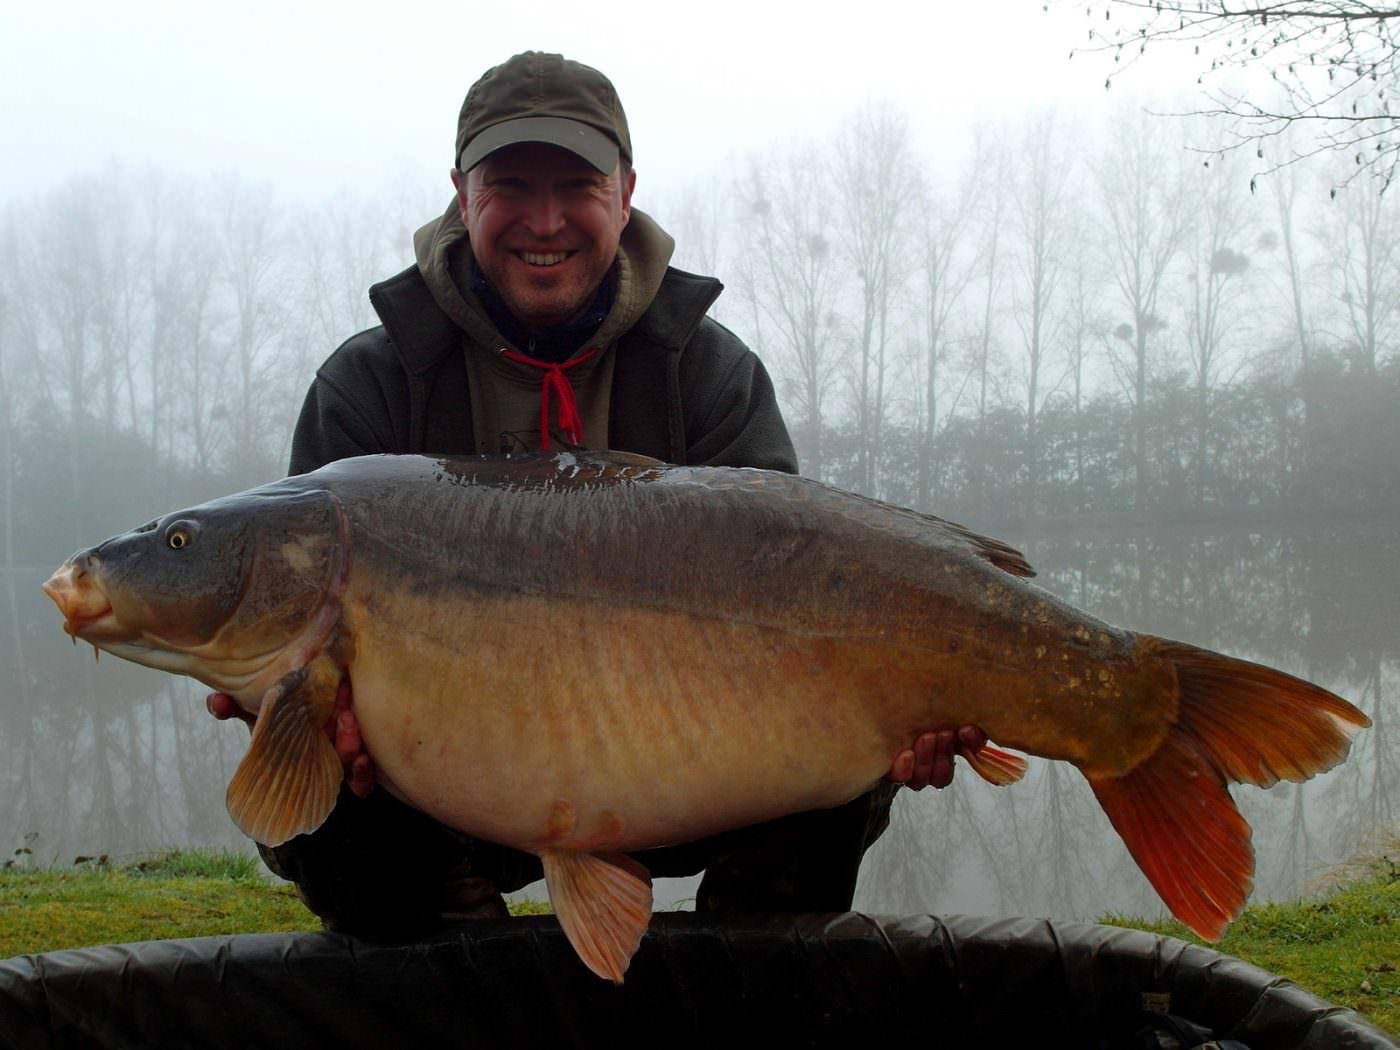 Matt with greyscar a mirror carp of 48lbs 4oz in spring